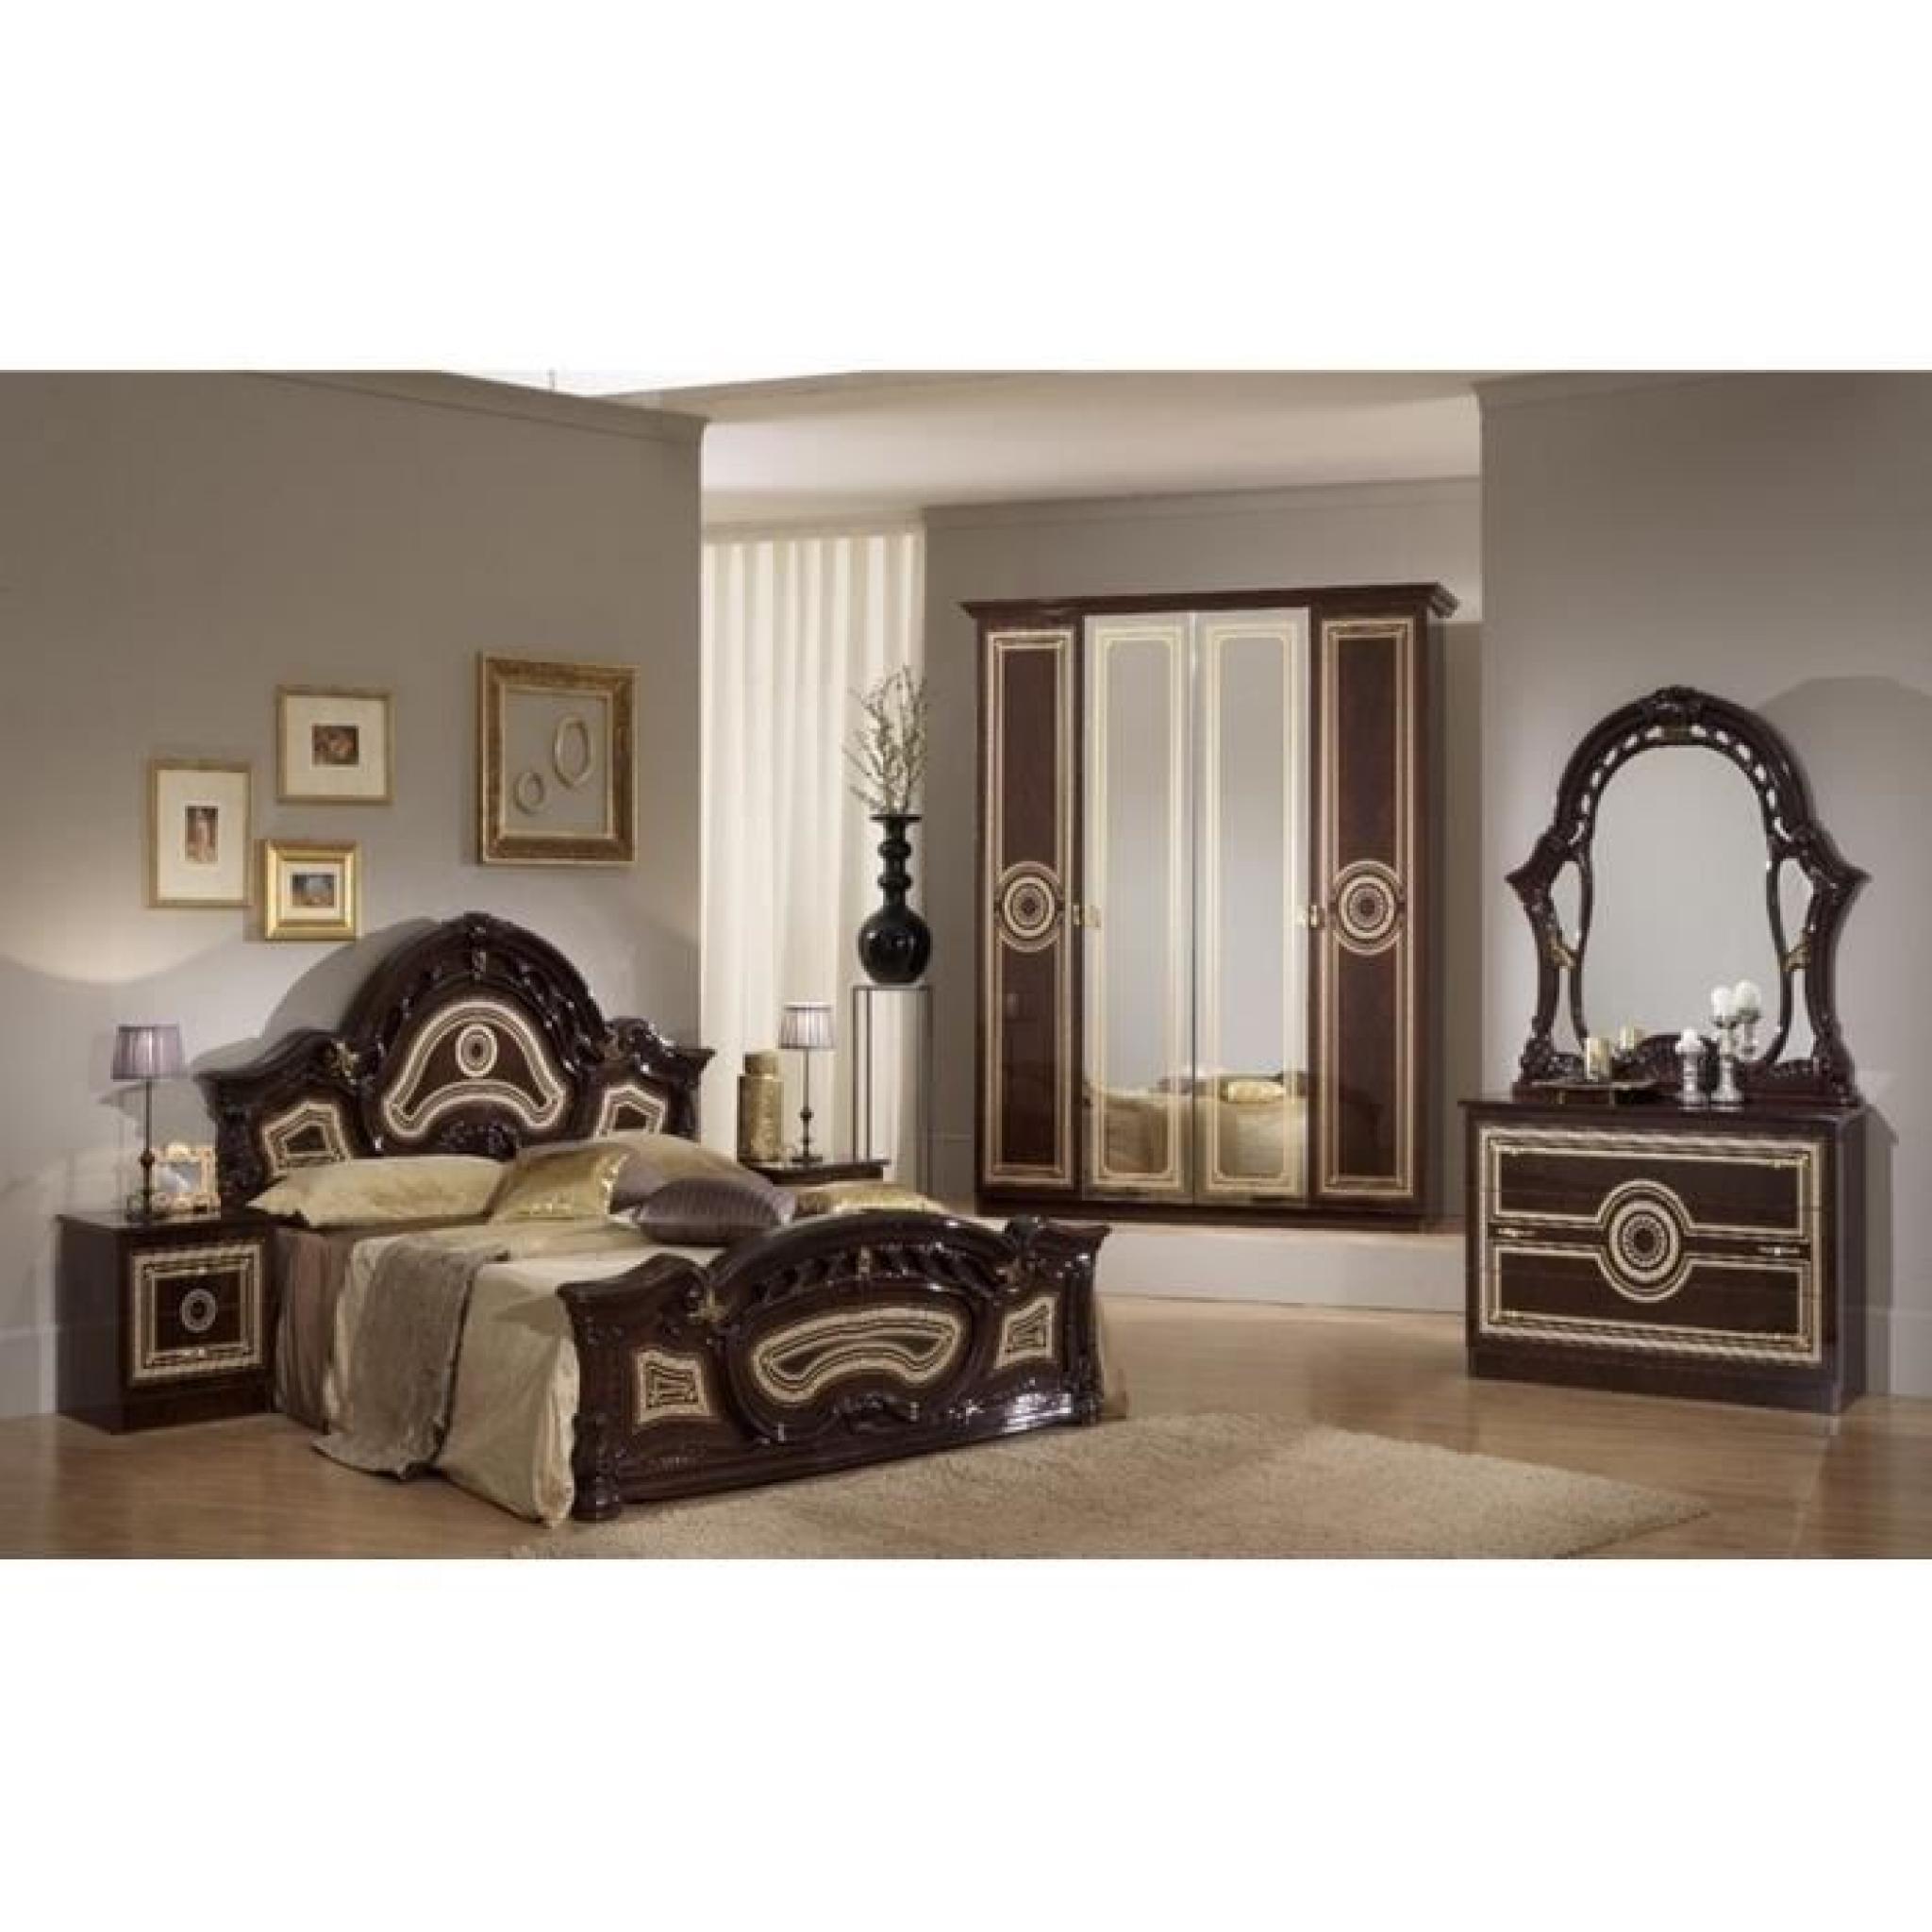 Chambre à coucher model sara (Marron fonce)